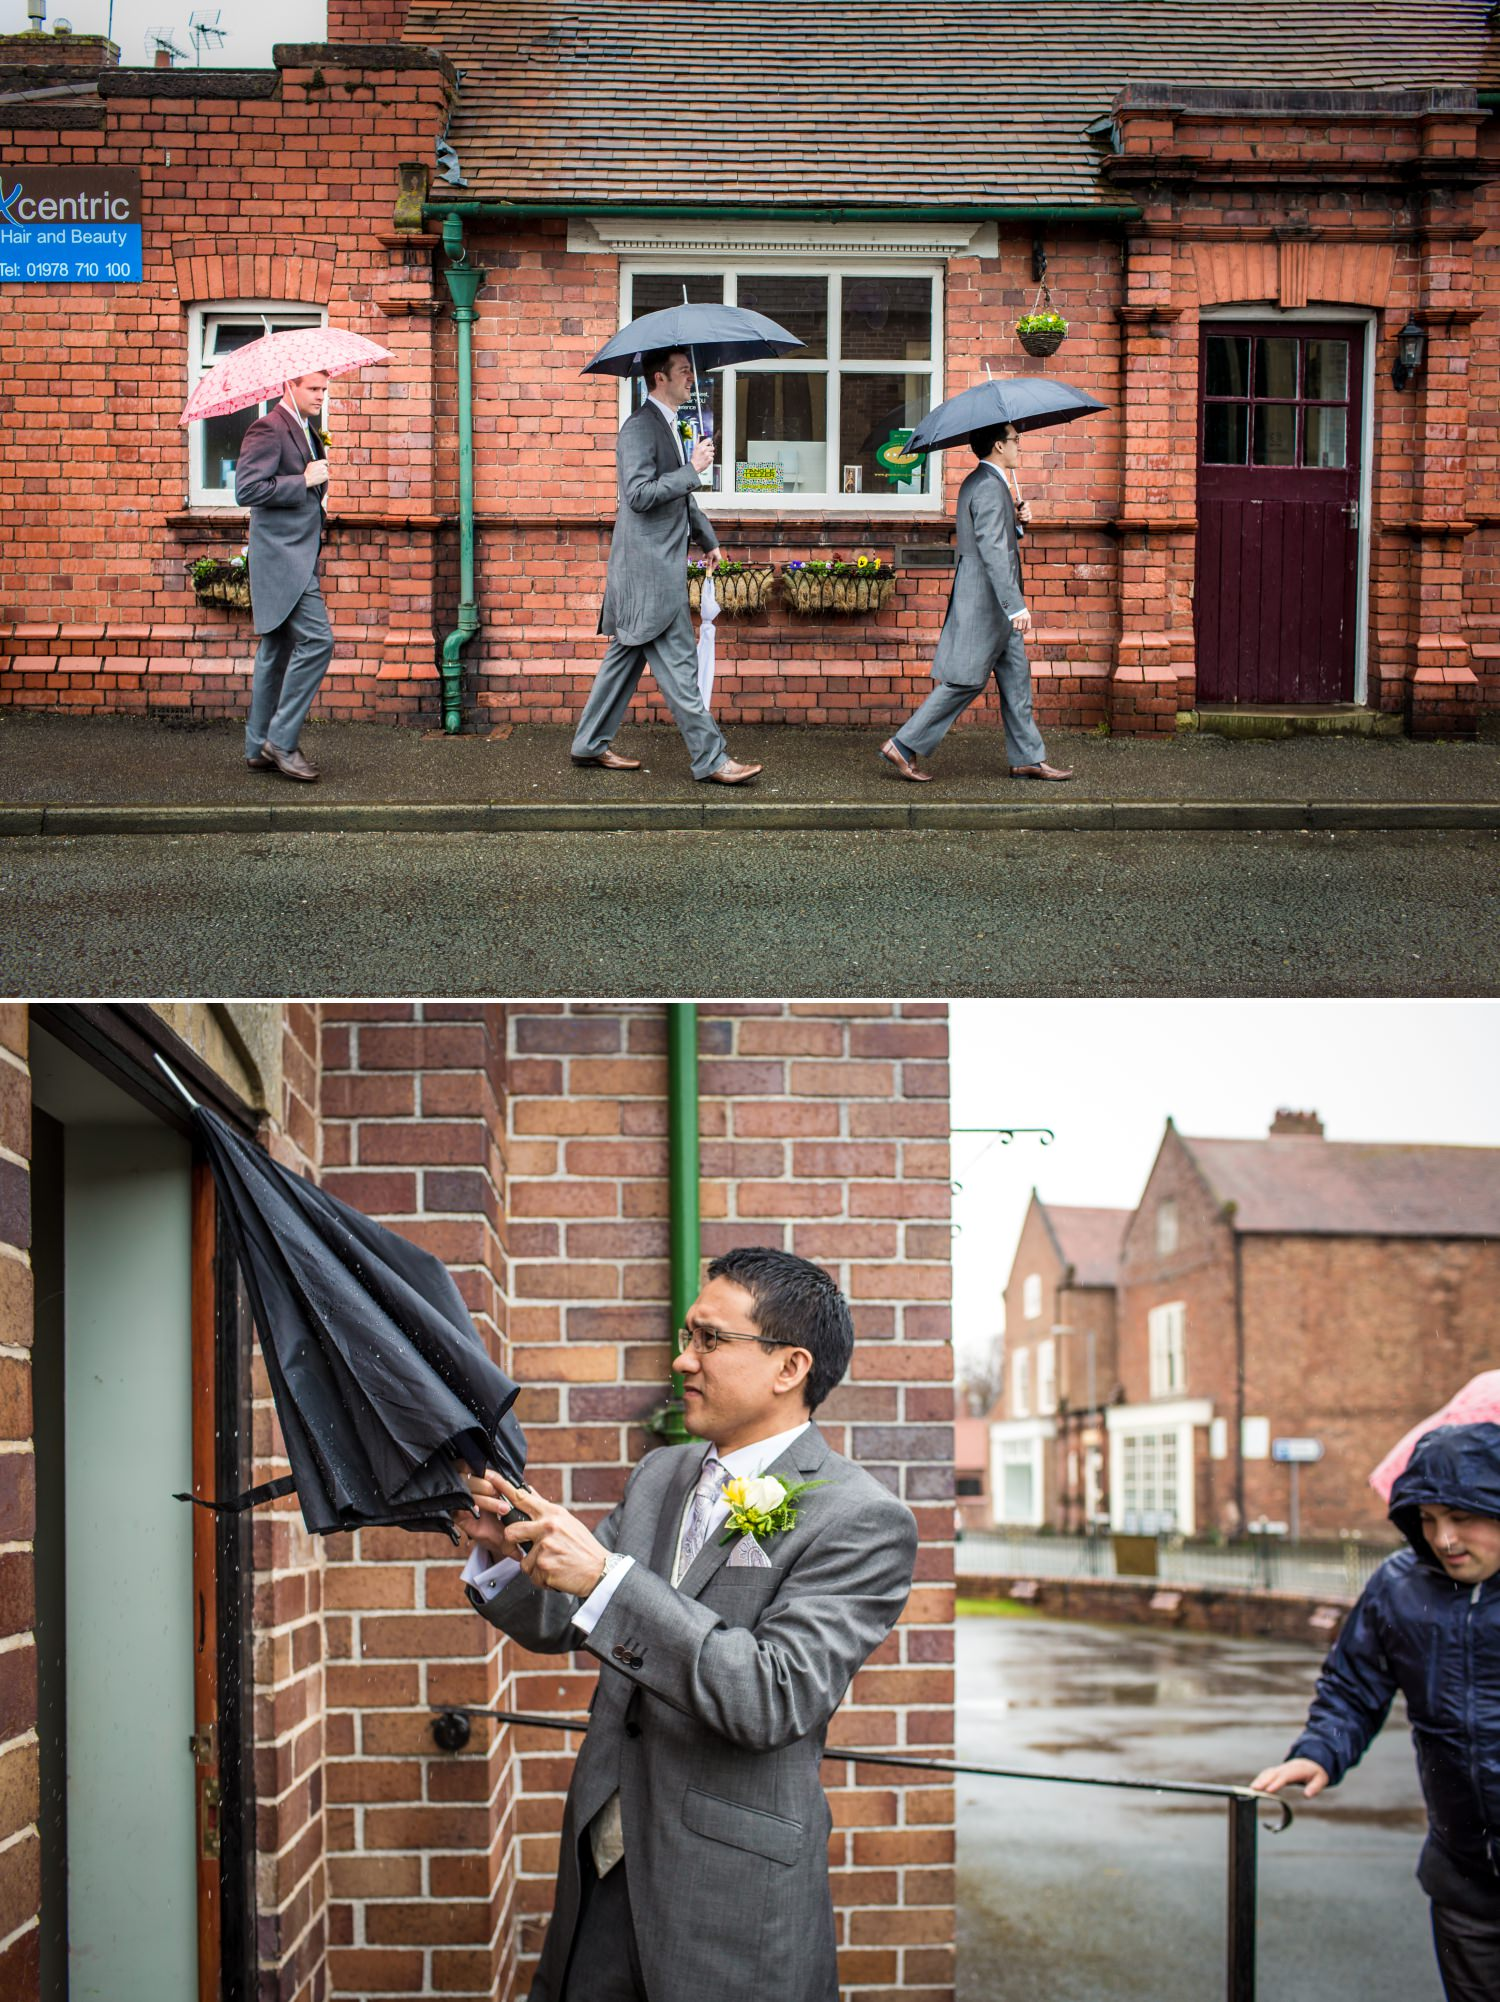 Wedding Photographof groomswen with umbrellas at Pimhill Barn, Shropshire